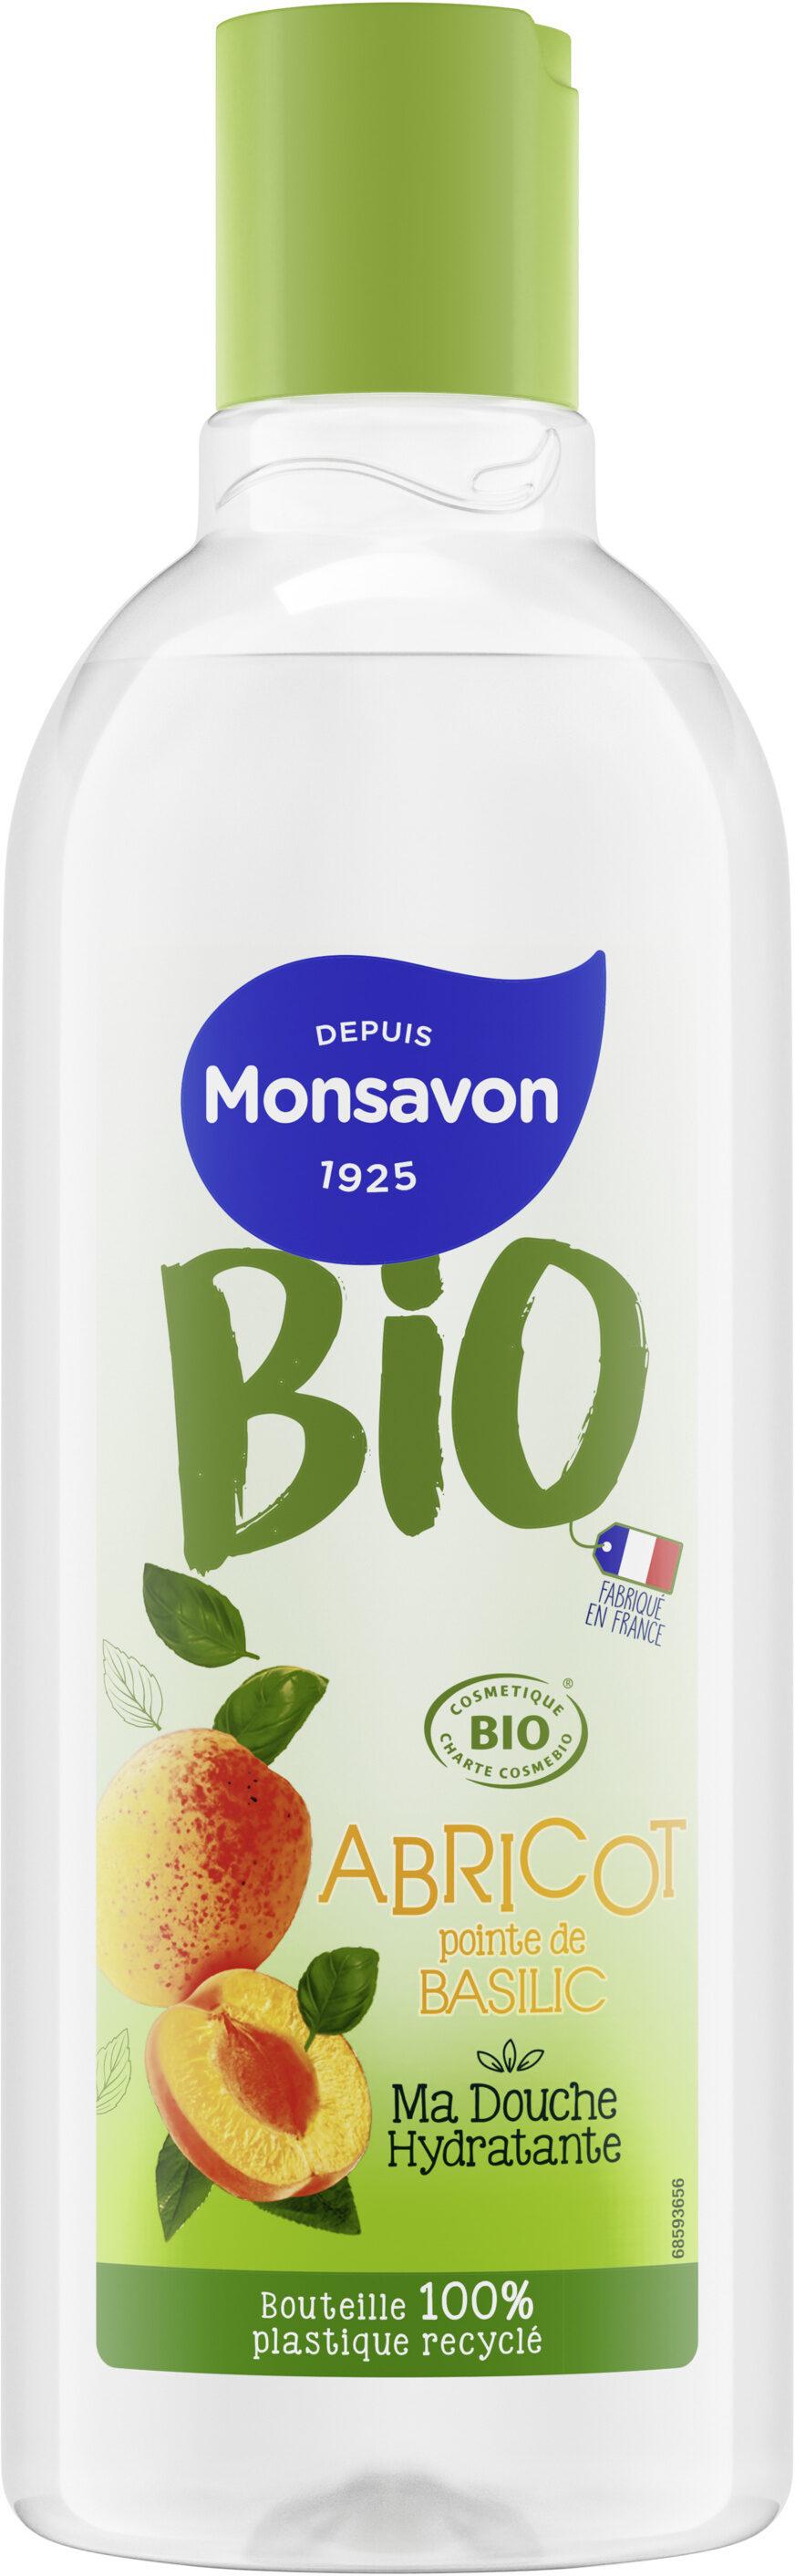 MONSAVON Gel Douche Bio Abricot & Basilic - Product - fr